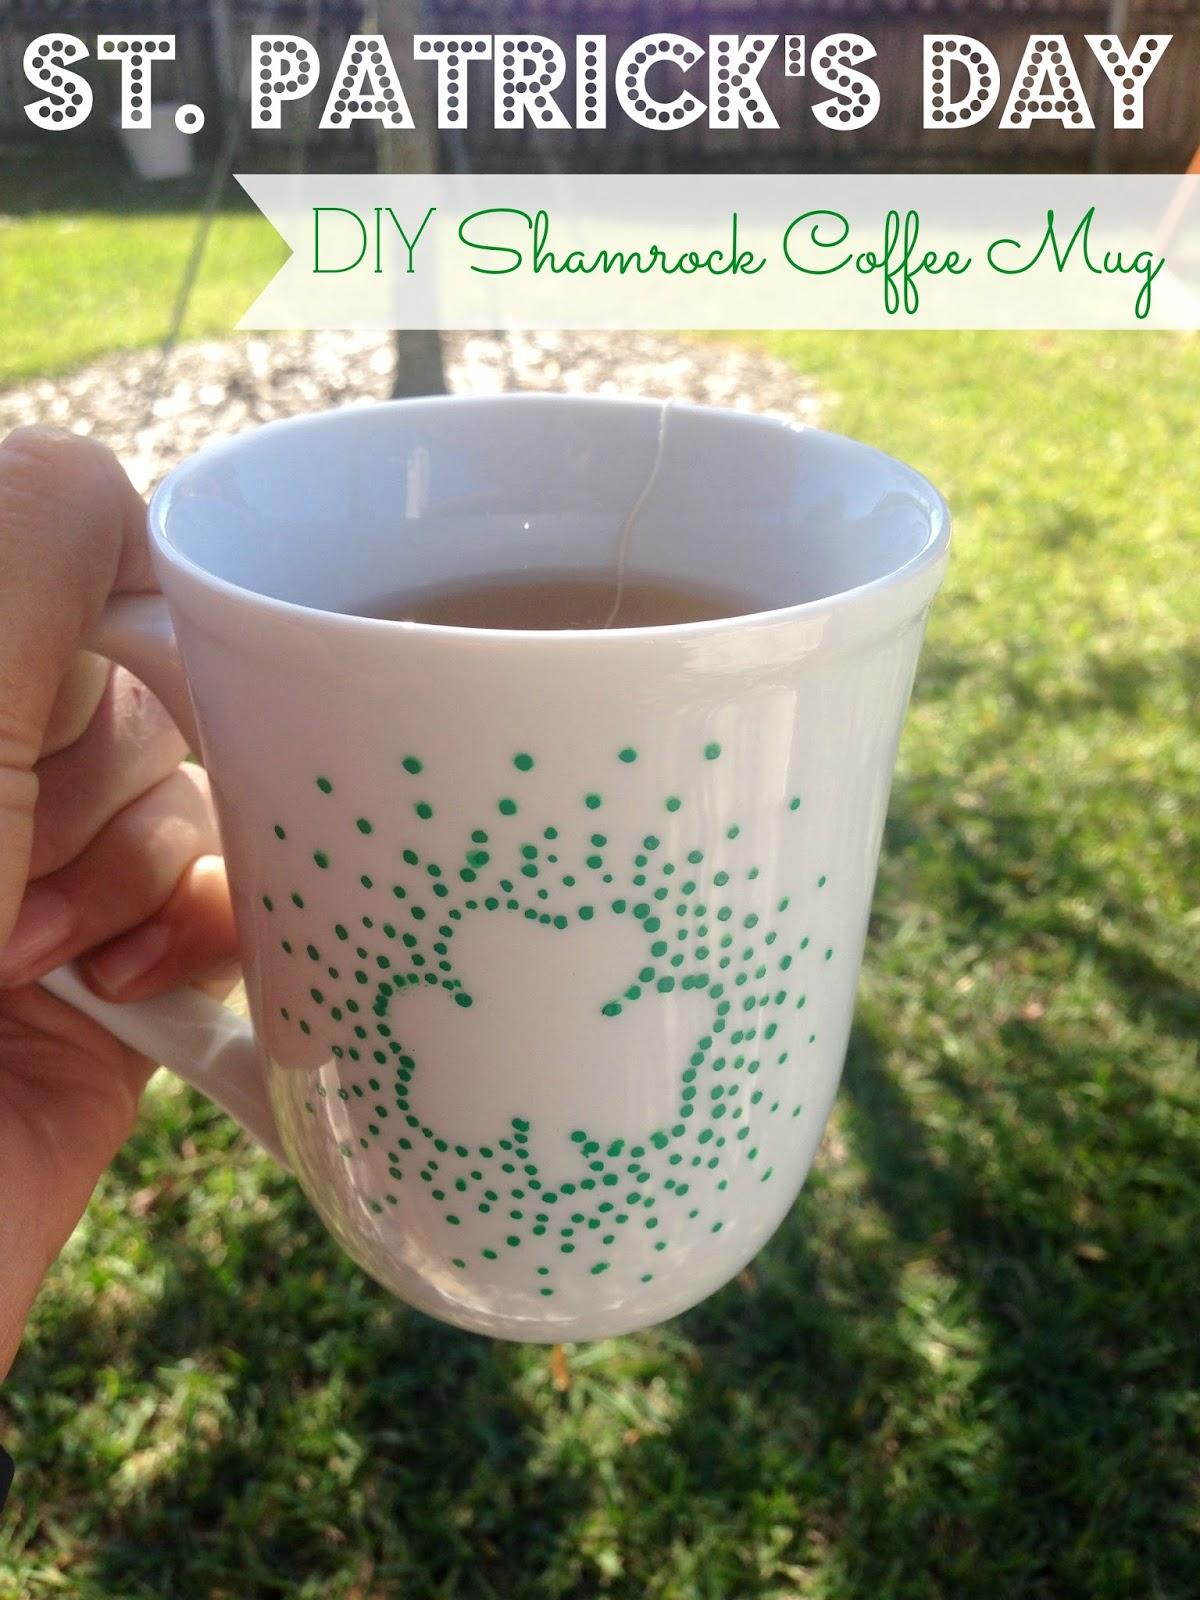 DIY Shamrock Coffee Mug